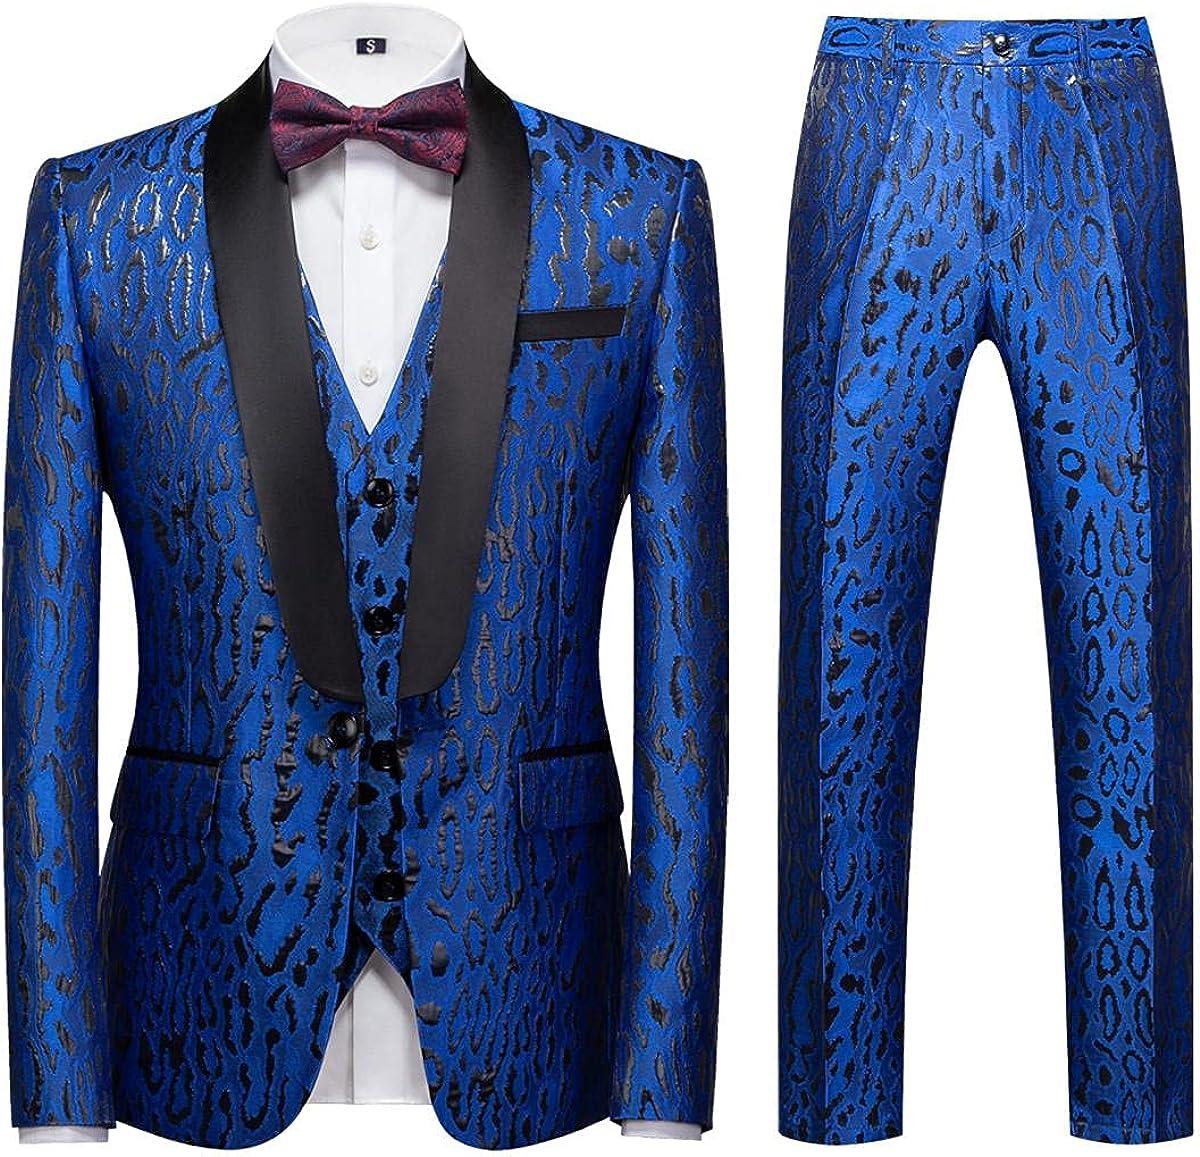 Men's 3 Piece Suits Regular Fit Classic Dinner Jacket Vest Pants Set Wedding Prom Shawl Lapel Jacquard Pattern